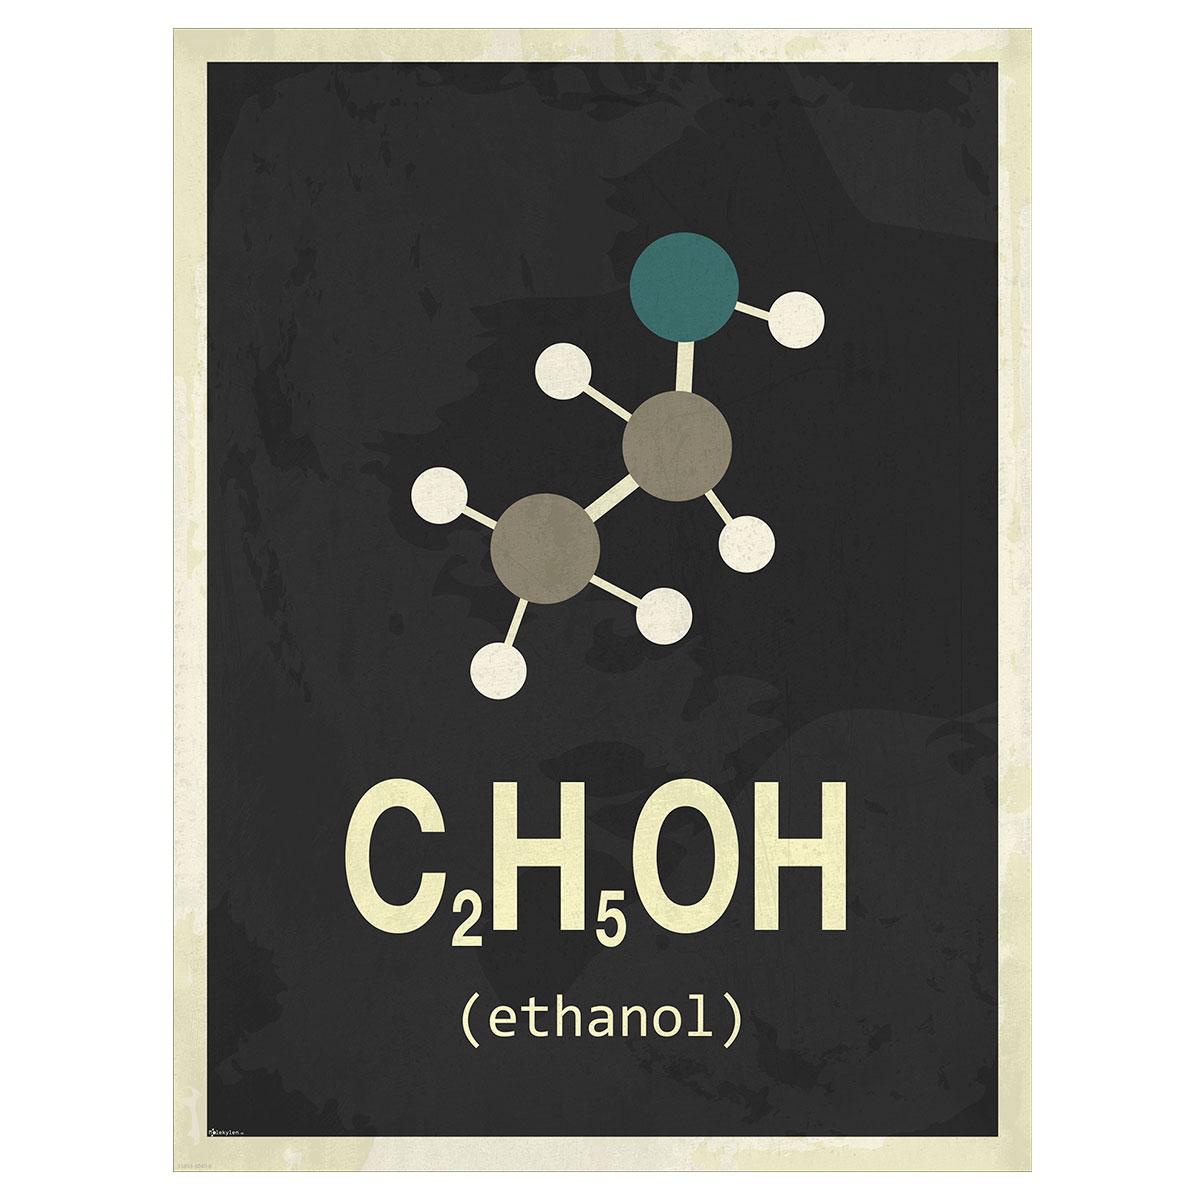 Ethanol plakat - Molekylen.dk